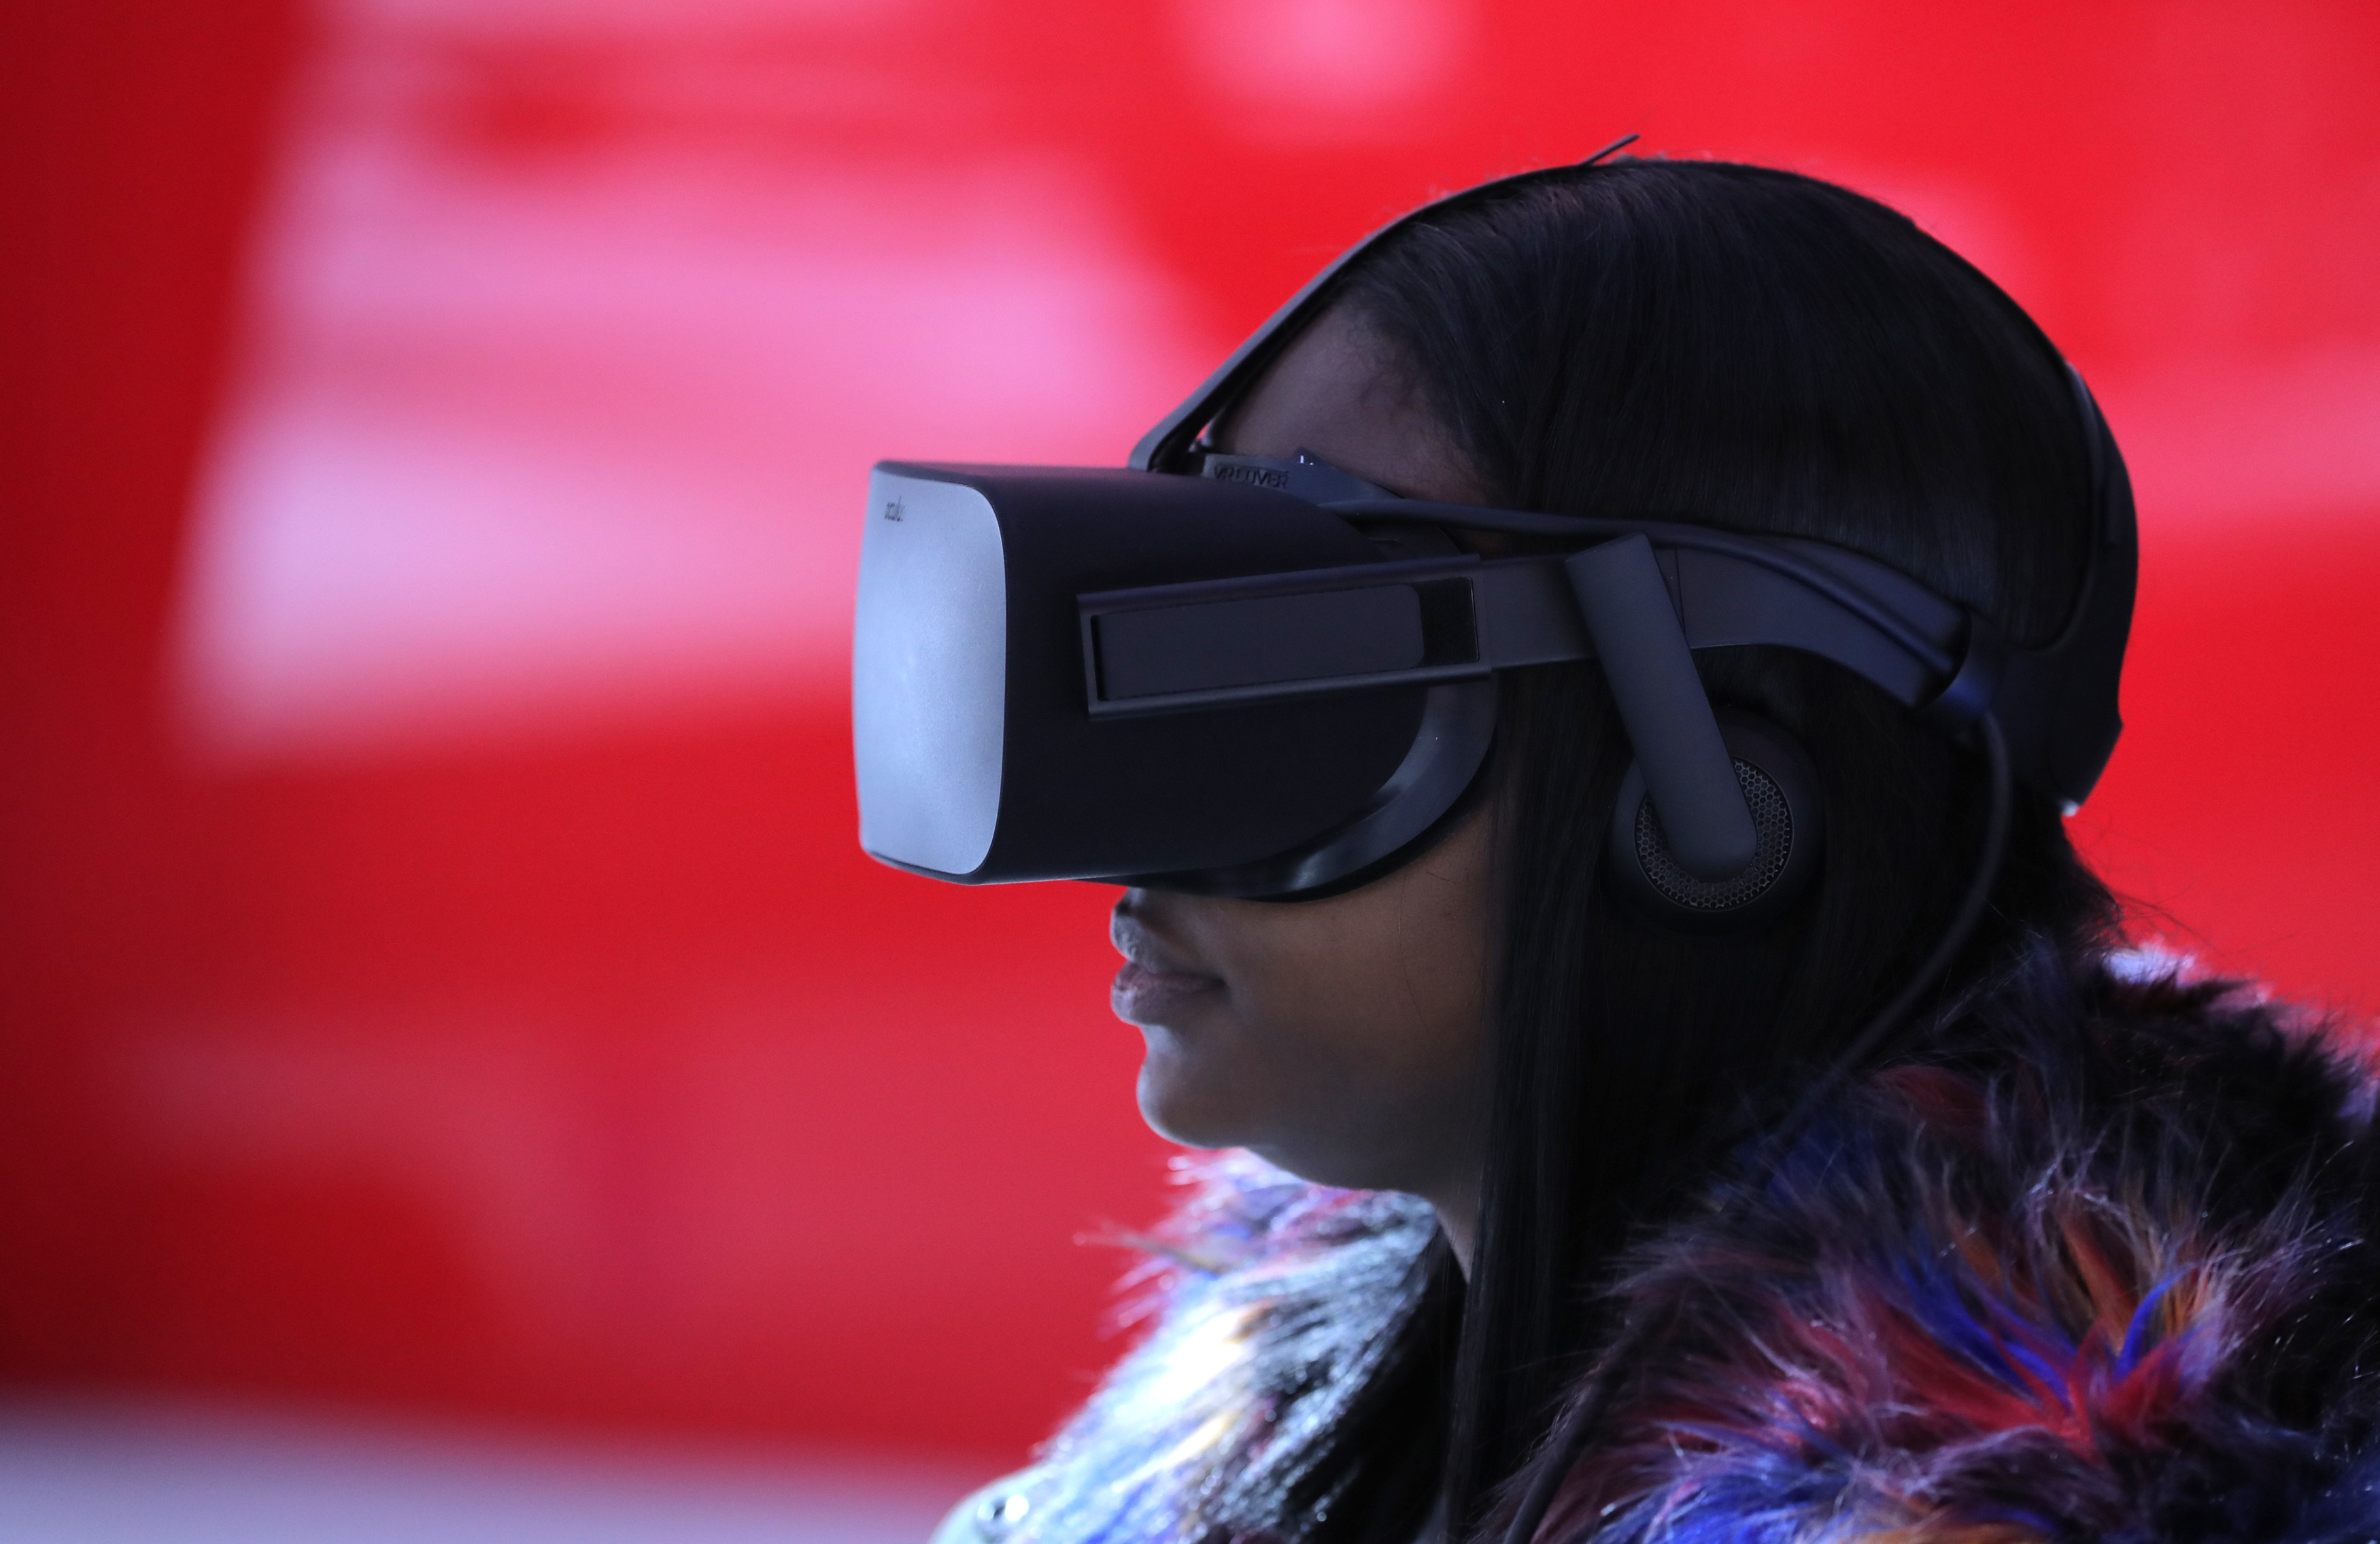 image of a woman wearing a virtual reality headset